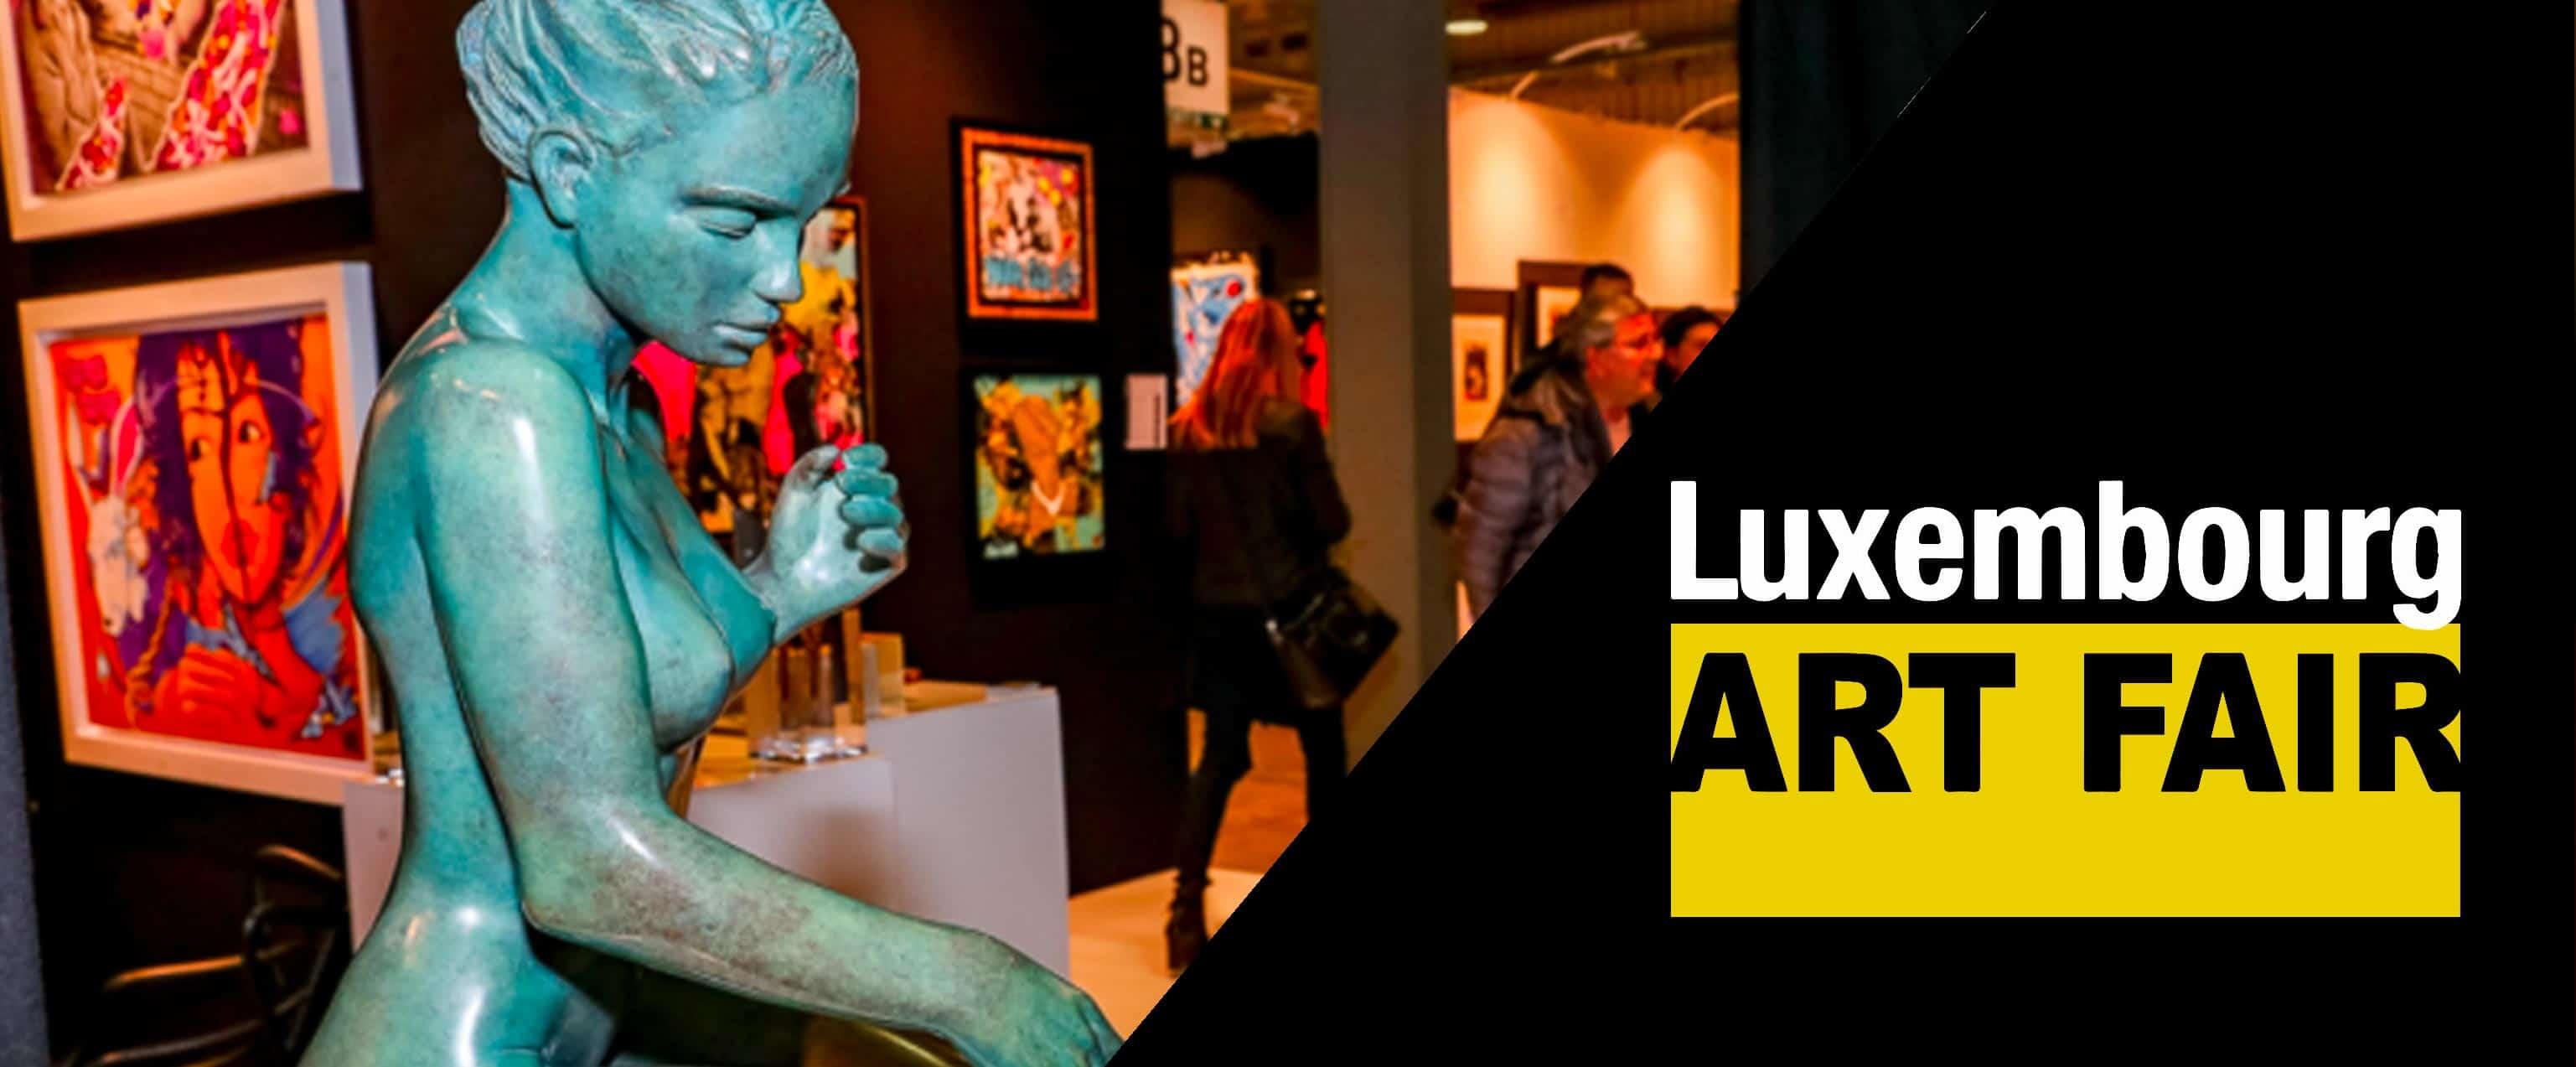 Galerie Don Carli Luxembourg Art Fair